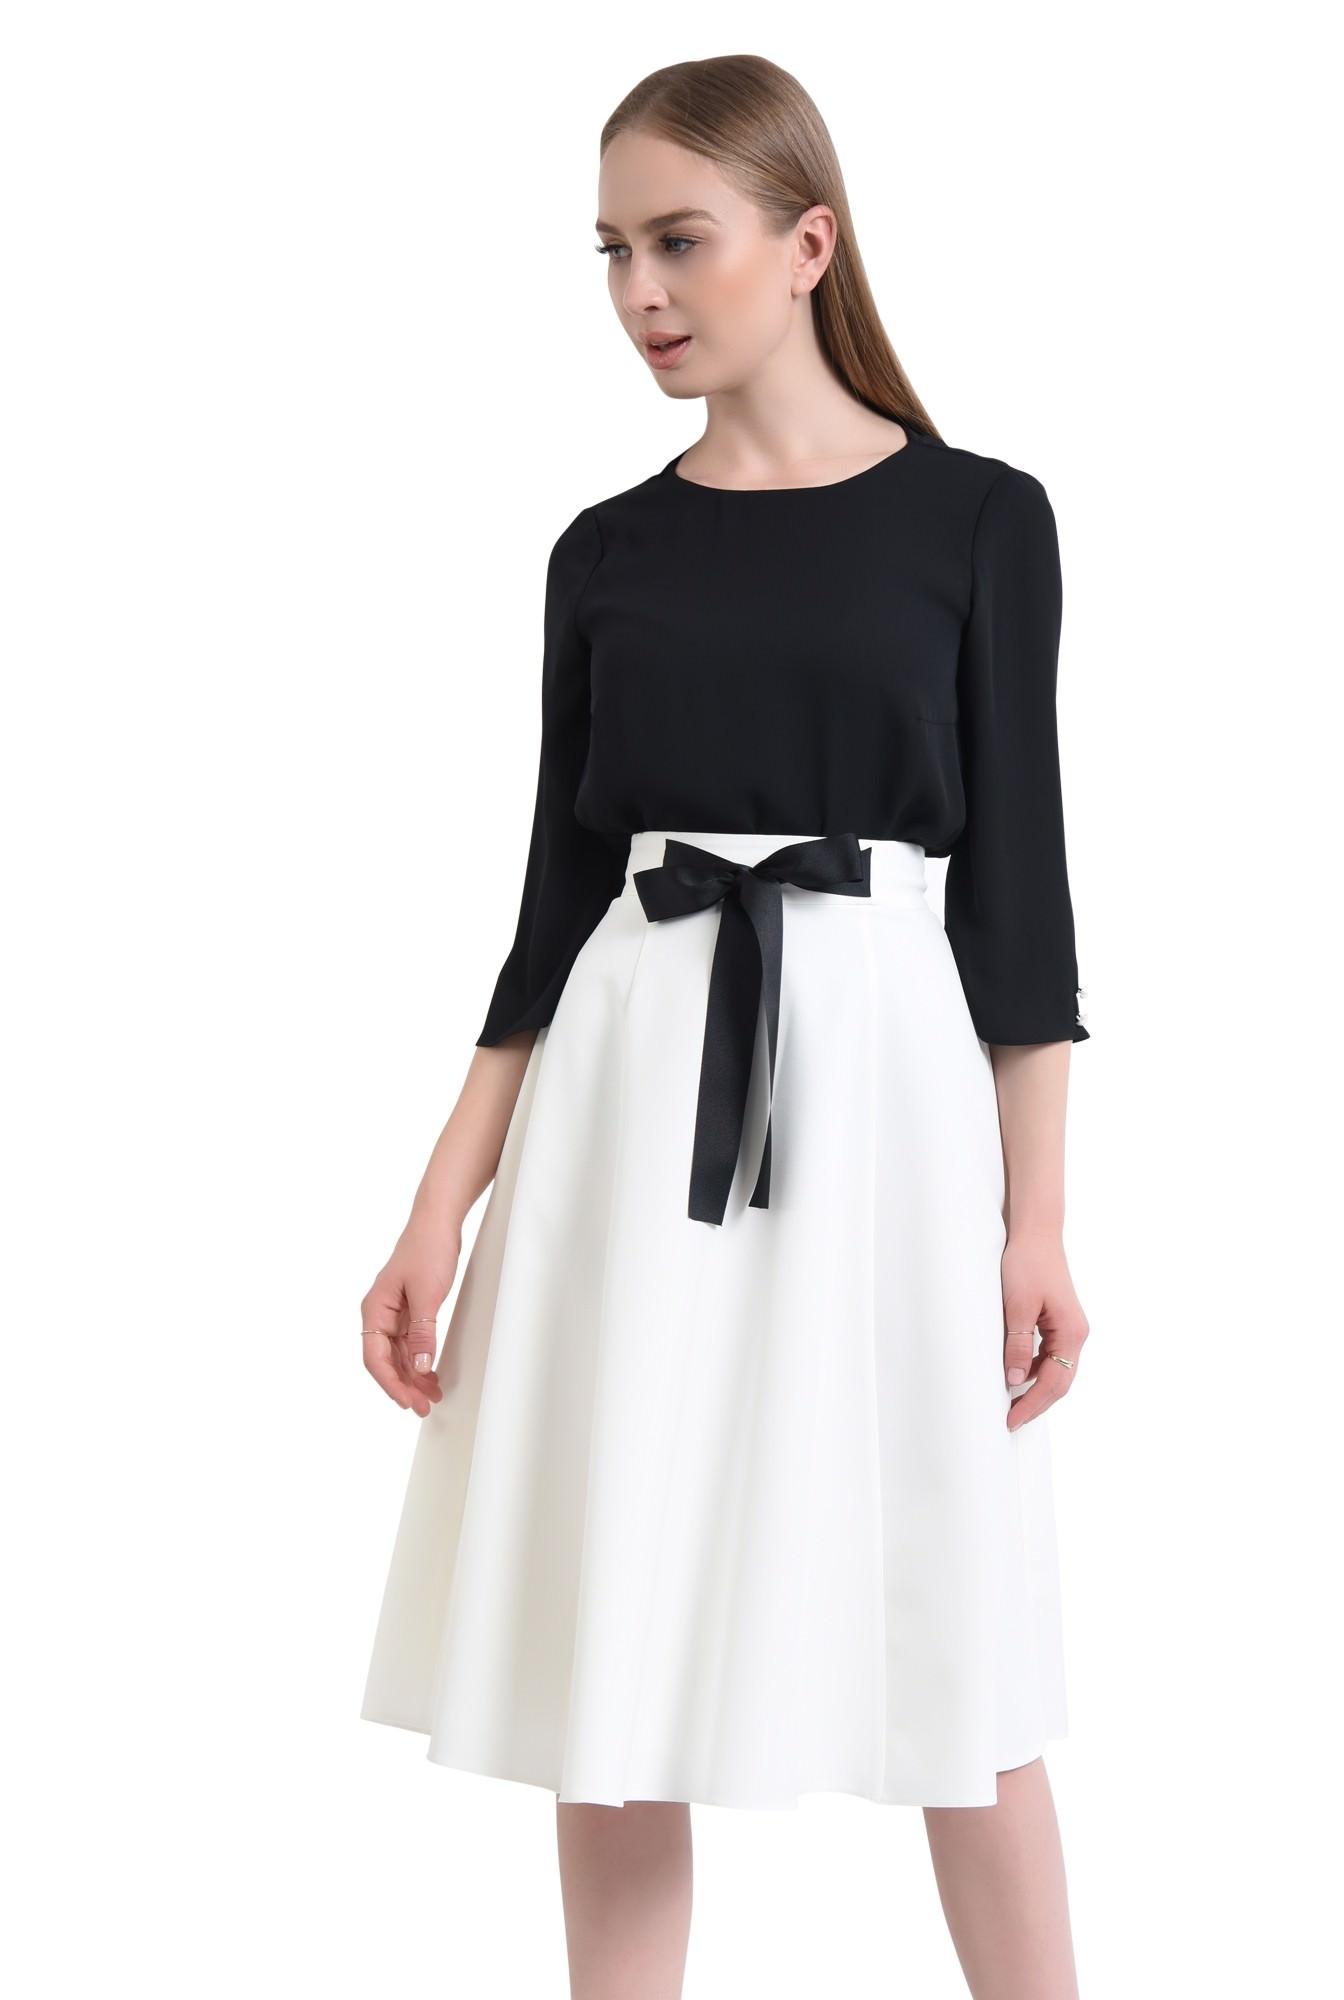 0 - Fusta eleganta, funda, contrast alb-negru